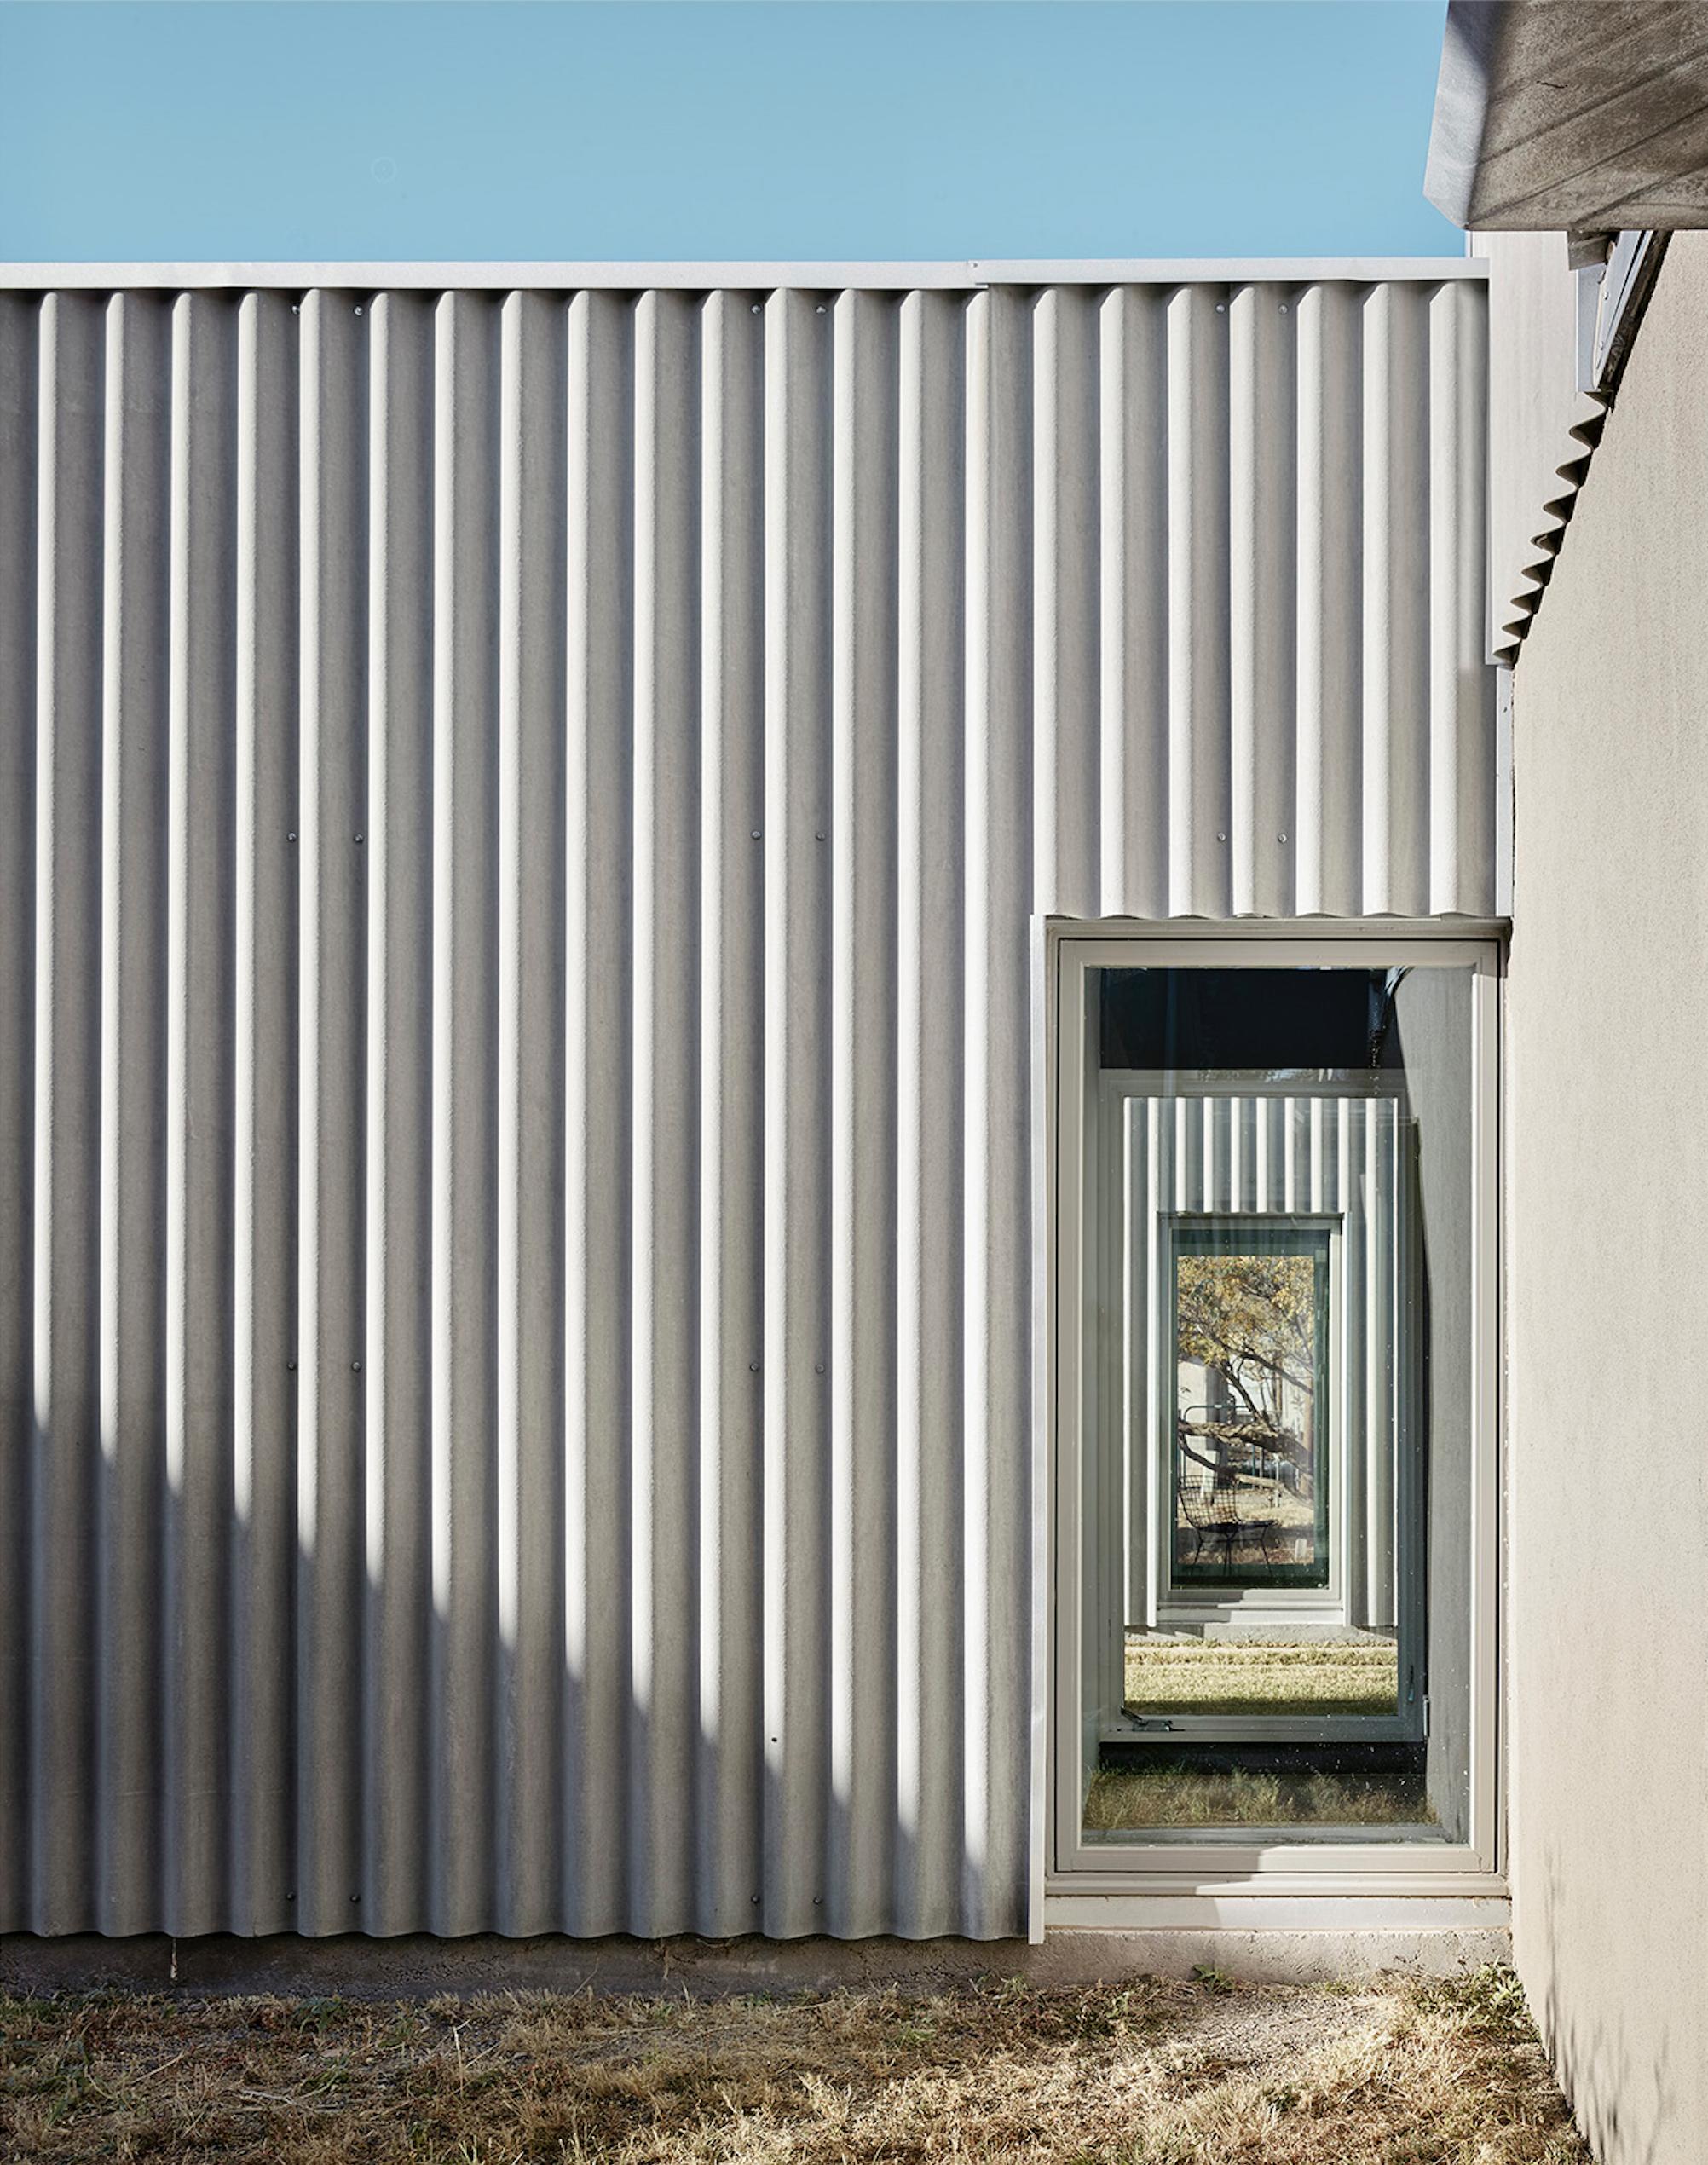 Kinney Morrow Corrugated Fiber Cement Board Panels Architecture Adobe House House Cladding